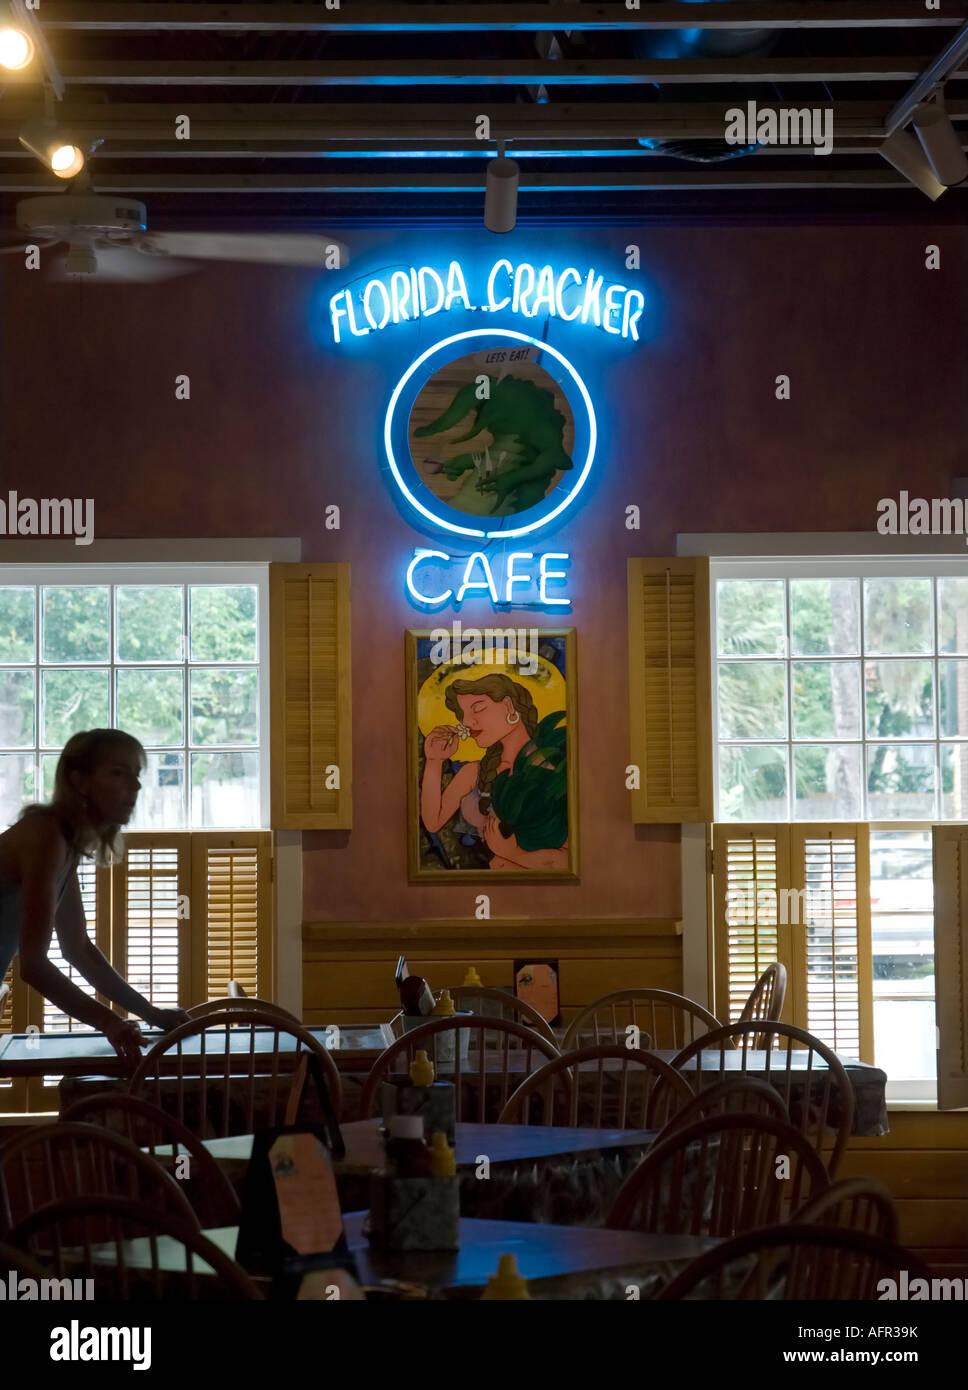 Florida Cracker Cafe Stockfotos & Florida Cracker Cafe Bilder - Alamy